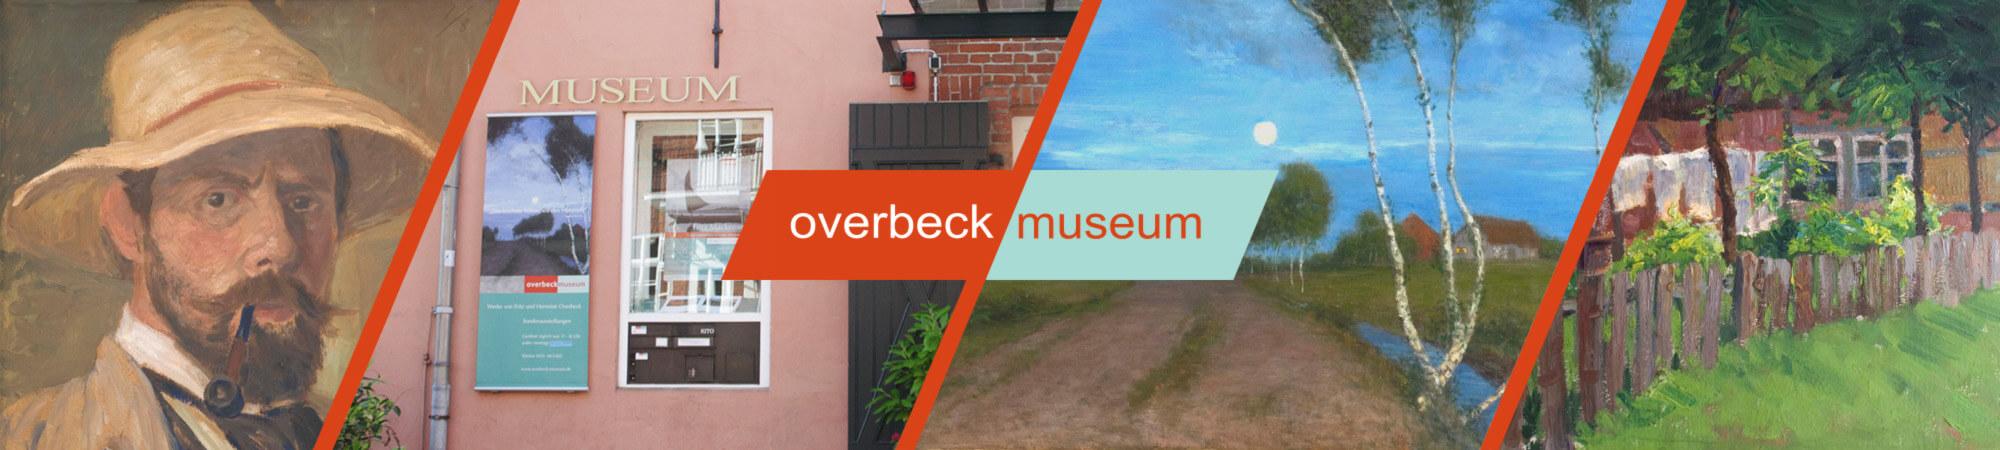 Titelbild Overbeck-Museum